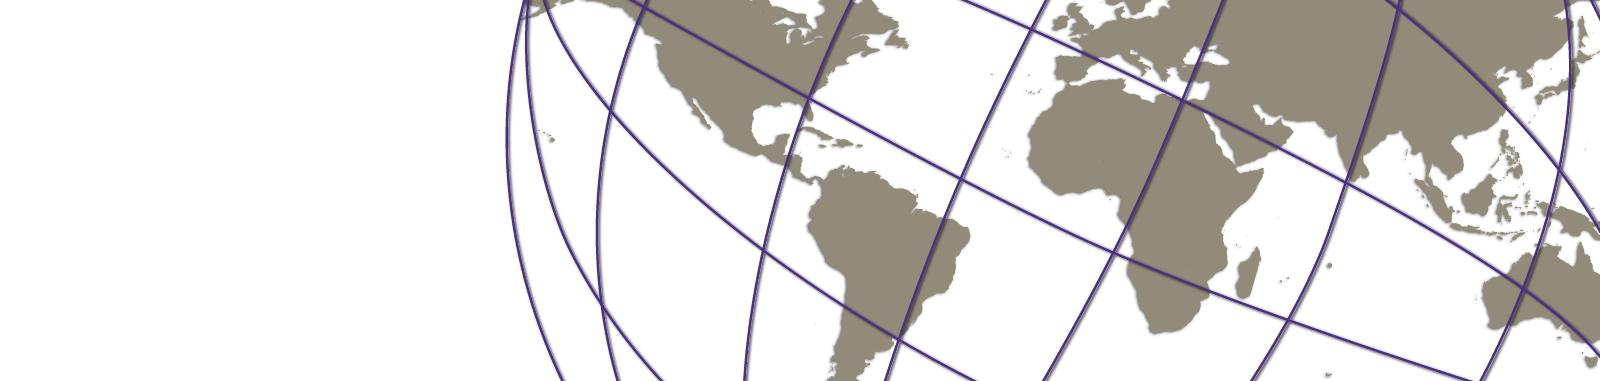 WILJ globe